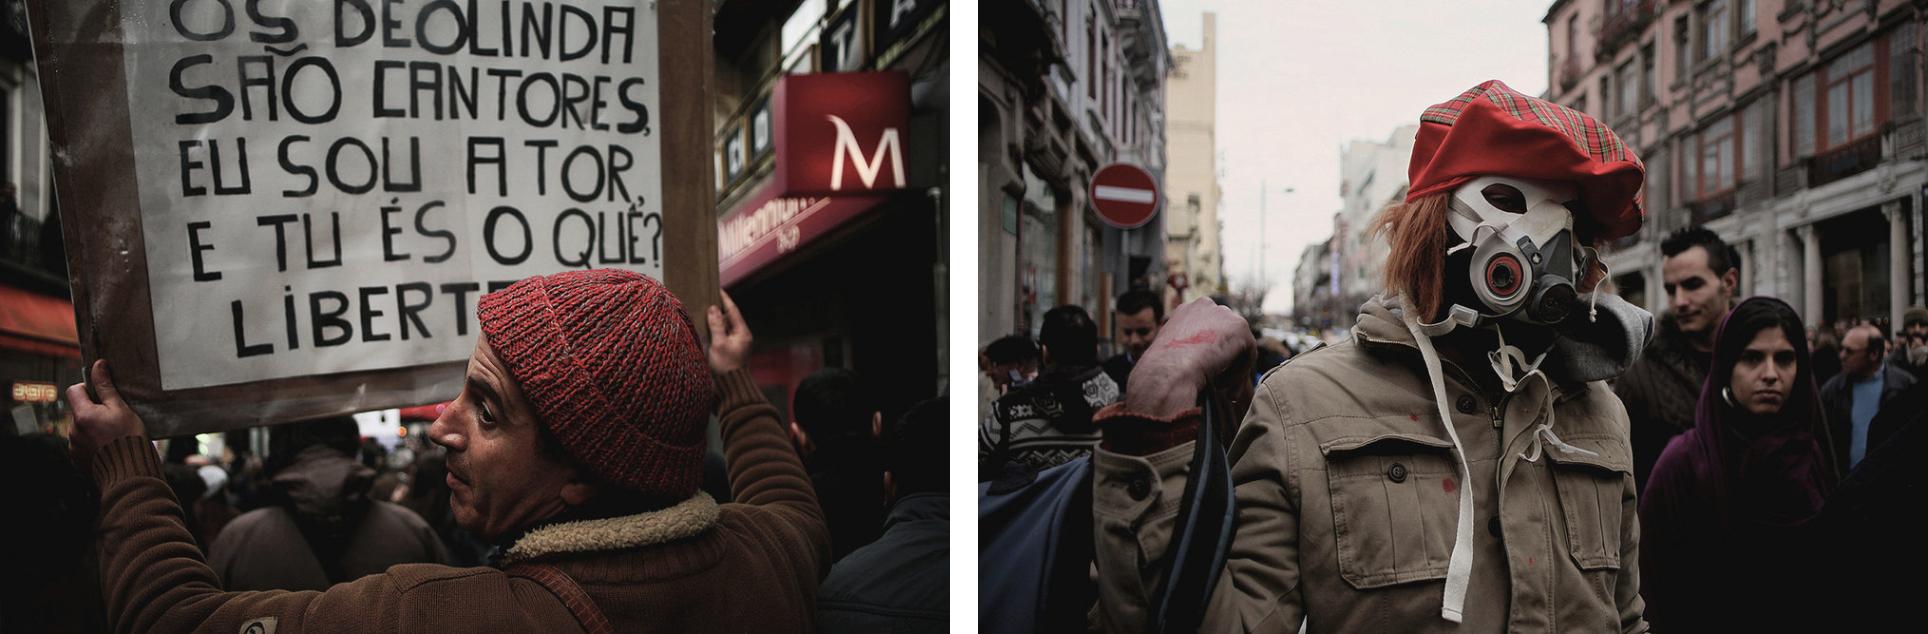 bonjourmolotov Andre Gigante Photography 02.png